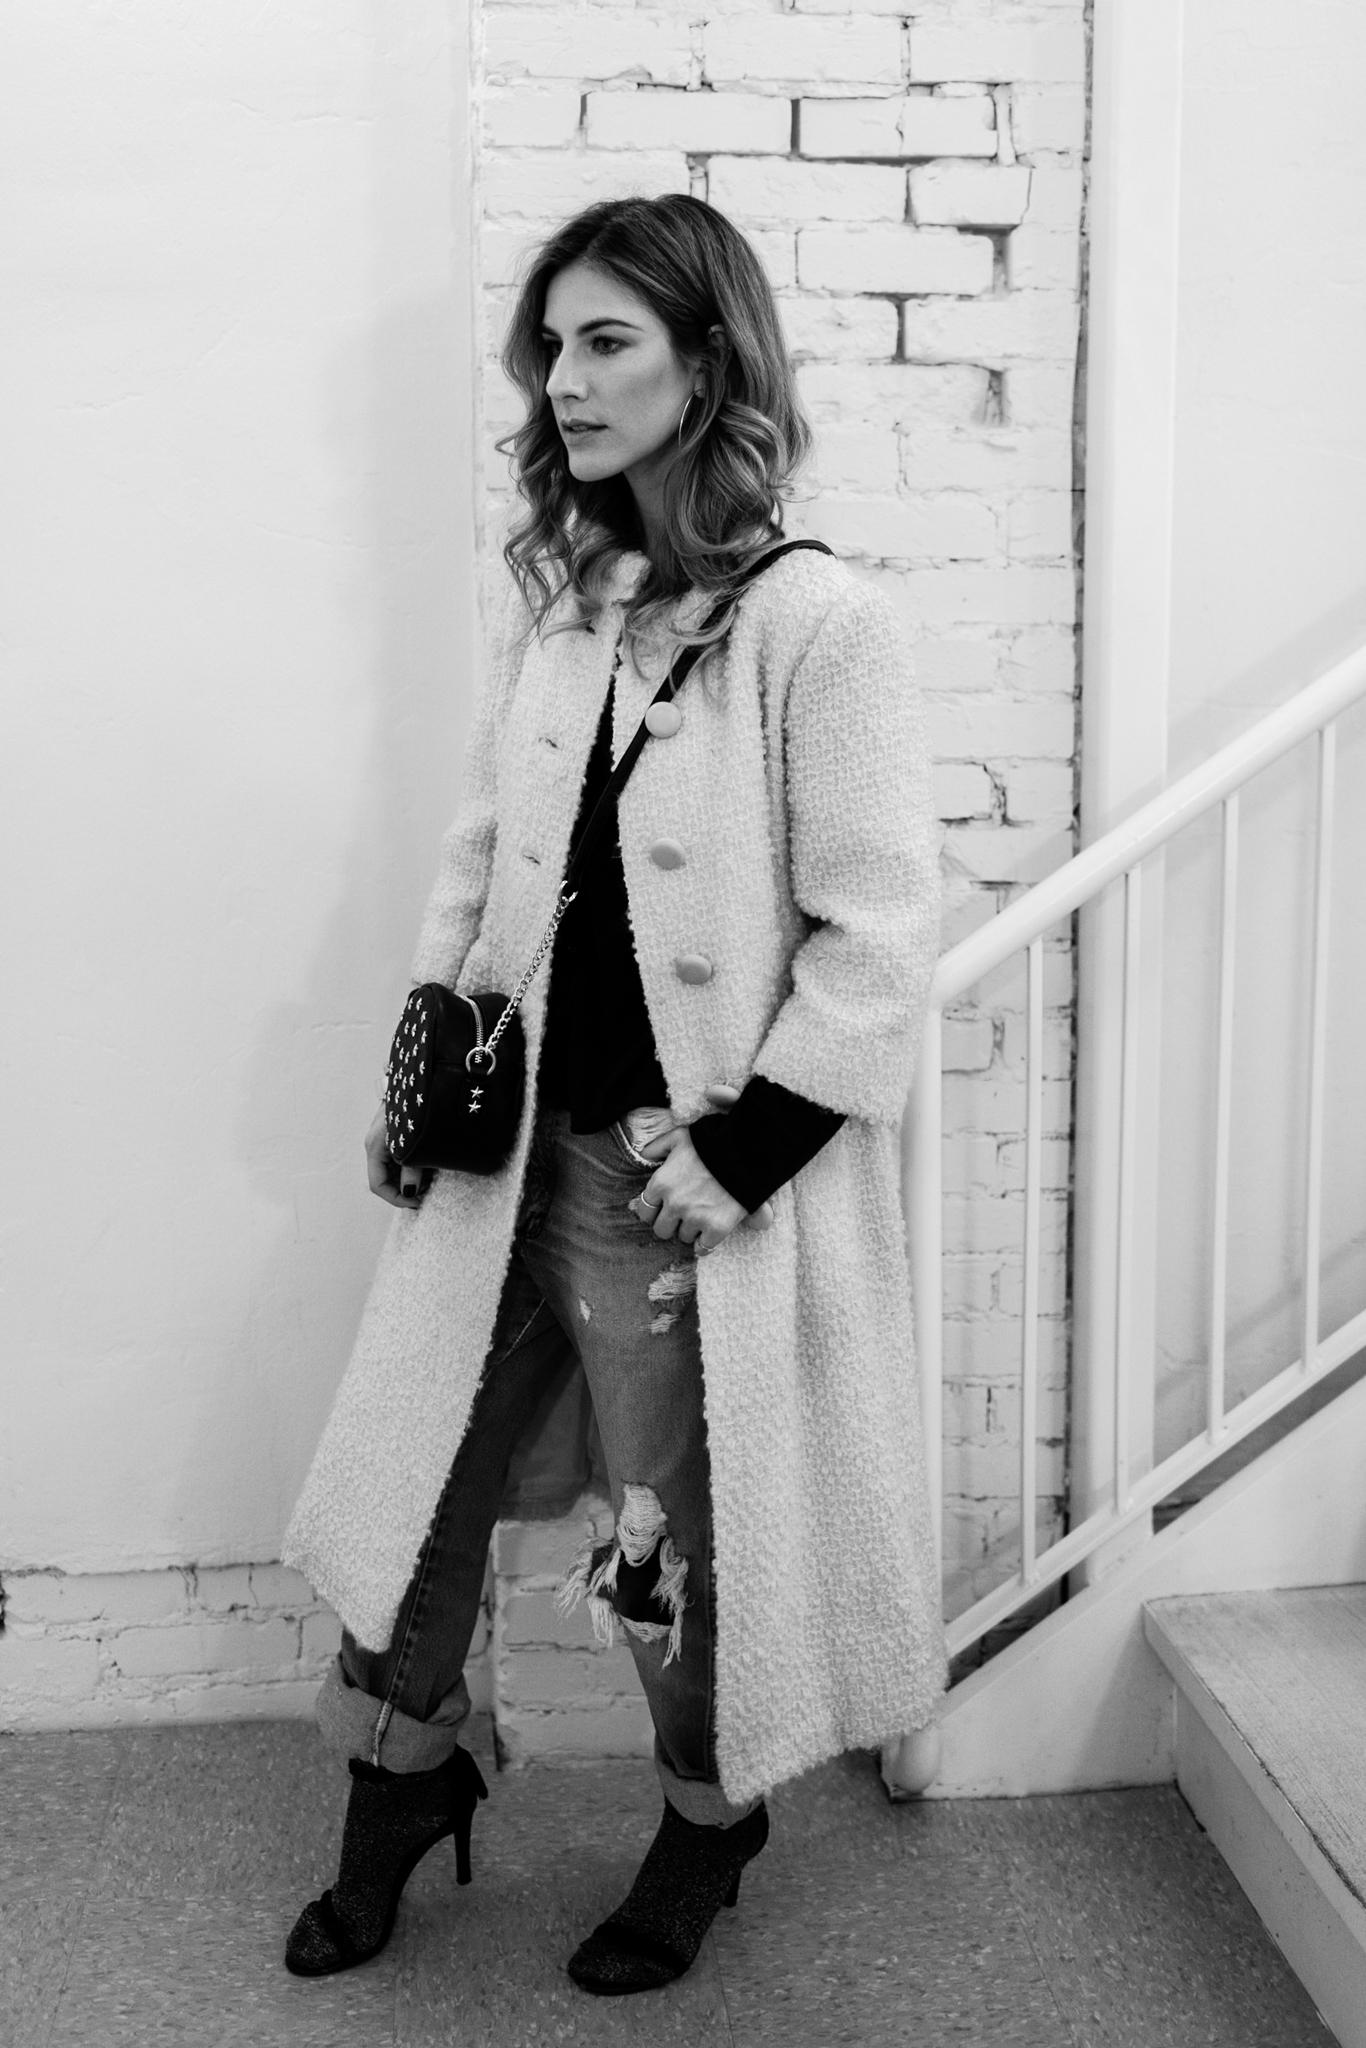 Eldridge Edit_Anna_E_Cottrell_Fashion_Blogger_Yellow_Vintage_Coat_Wrangler_Boyfriend_Jeans_Spring_Trend_2017_Star_Crossbody_Bag_Socks_with_Heels_Trend_MGB_Photo_4.jpg